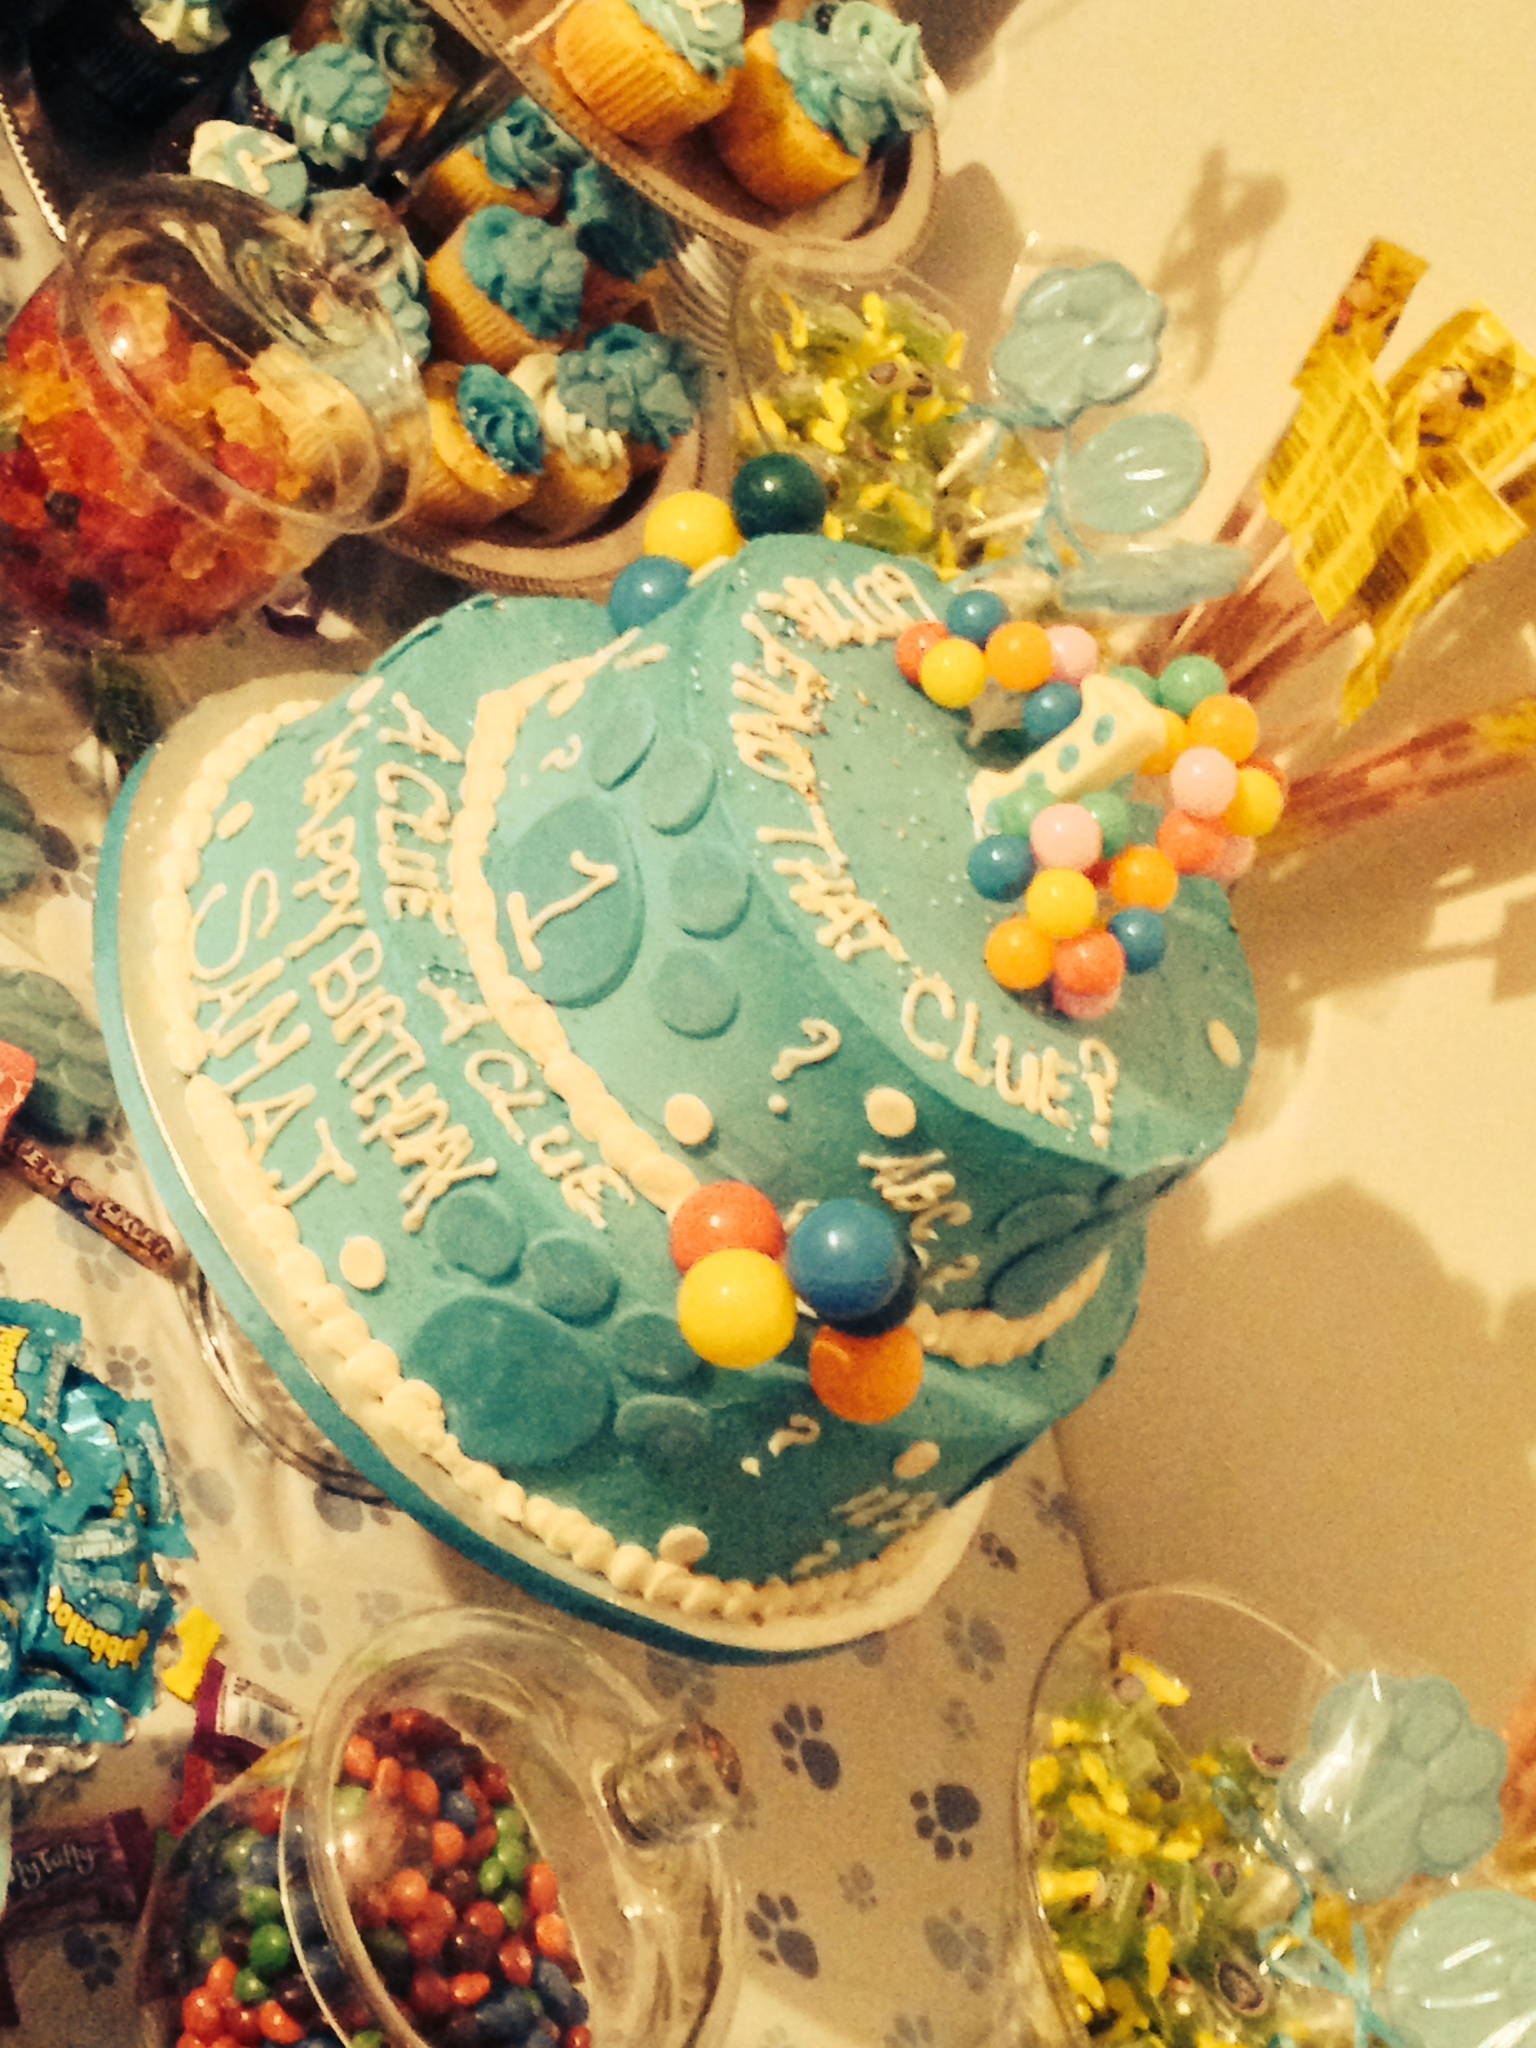 blues clues cake